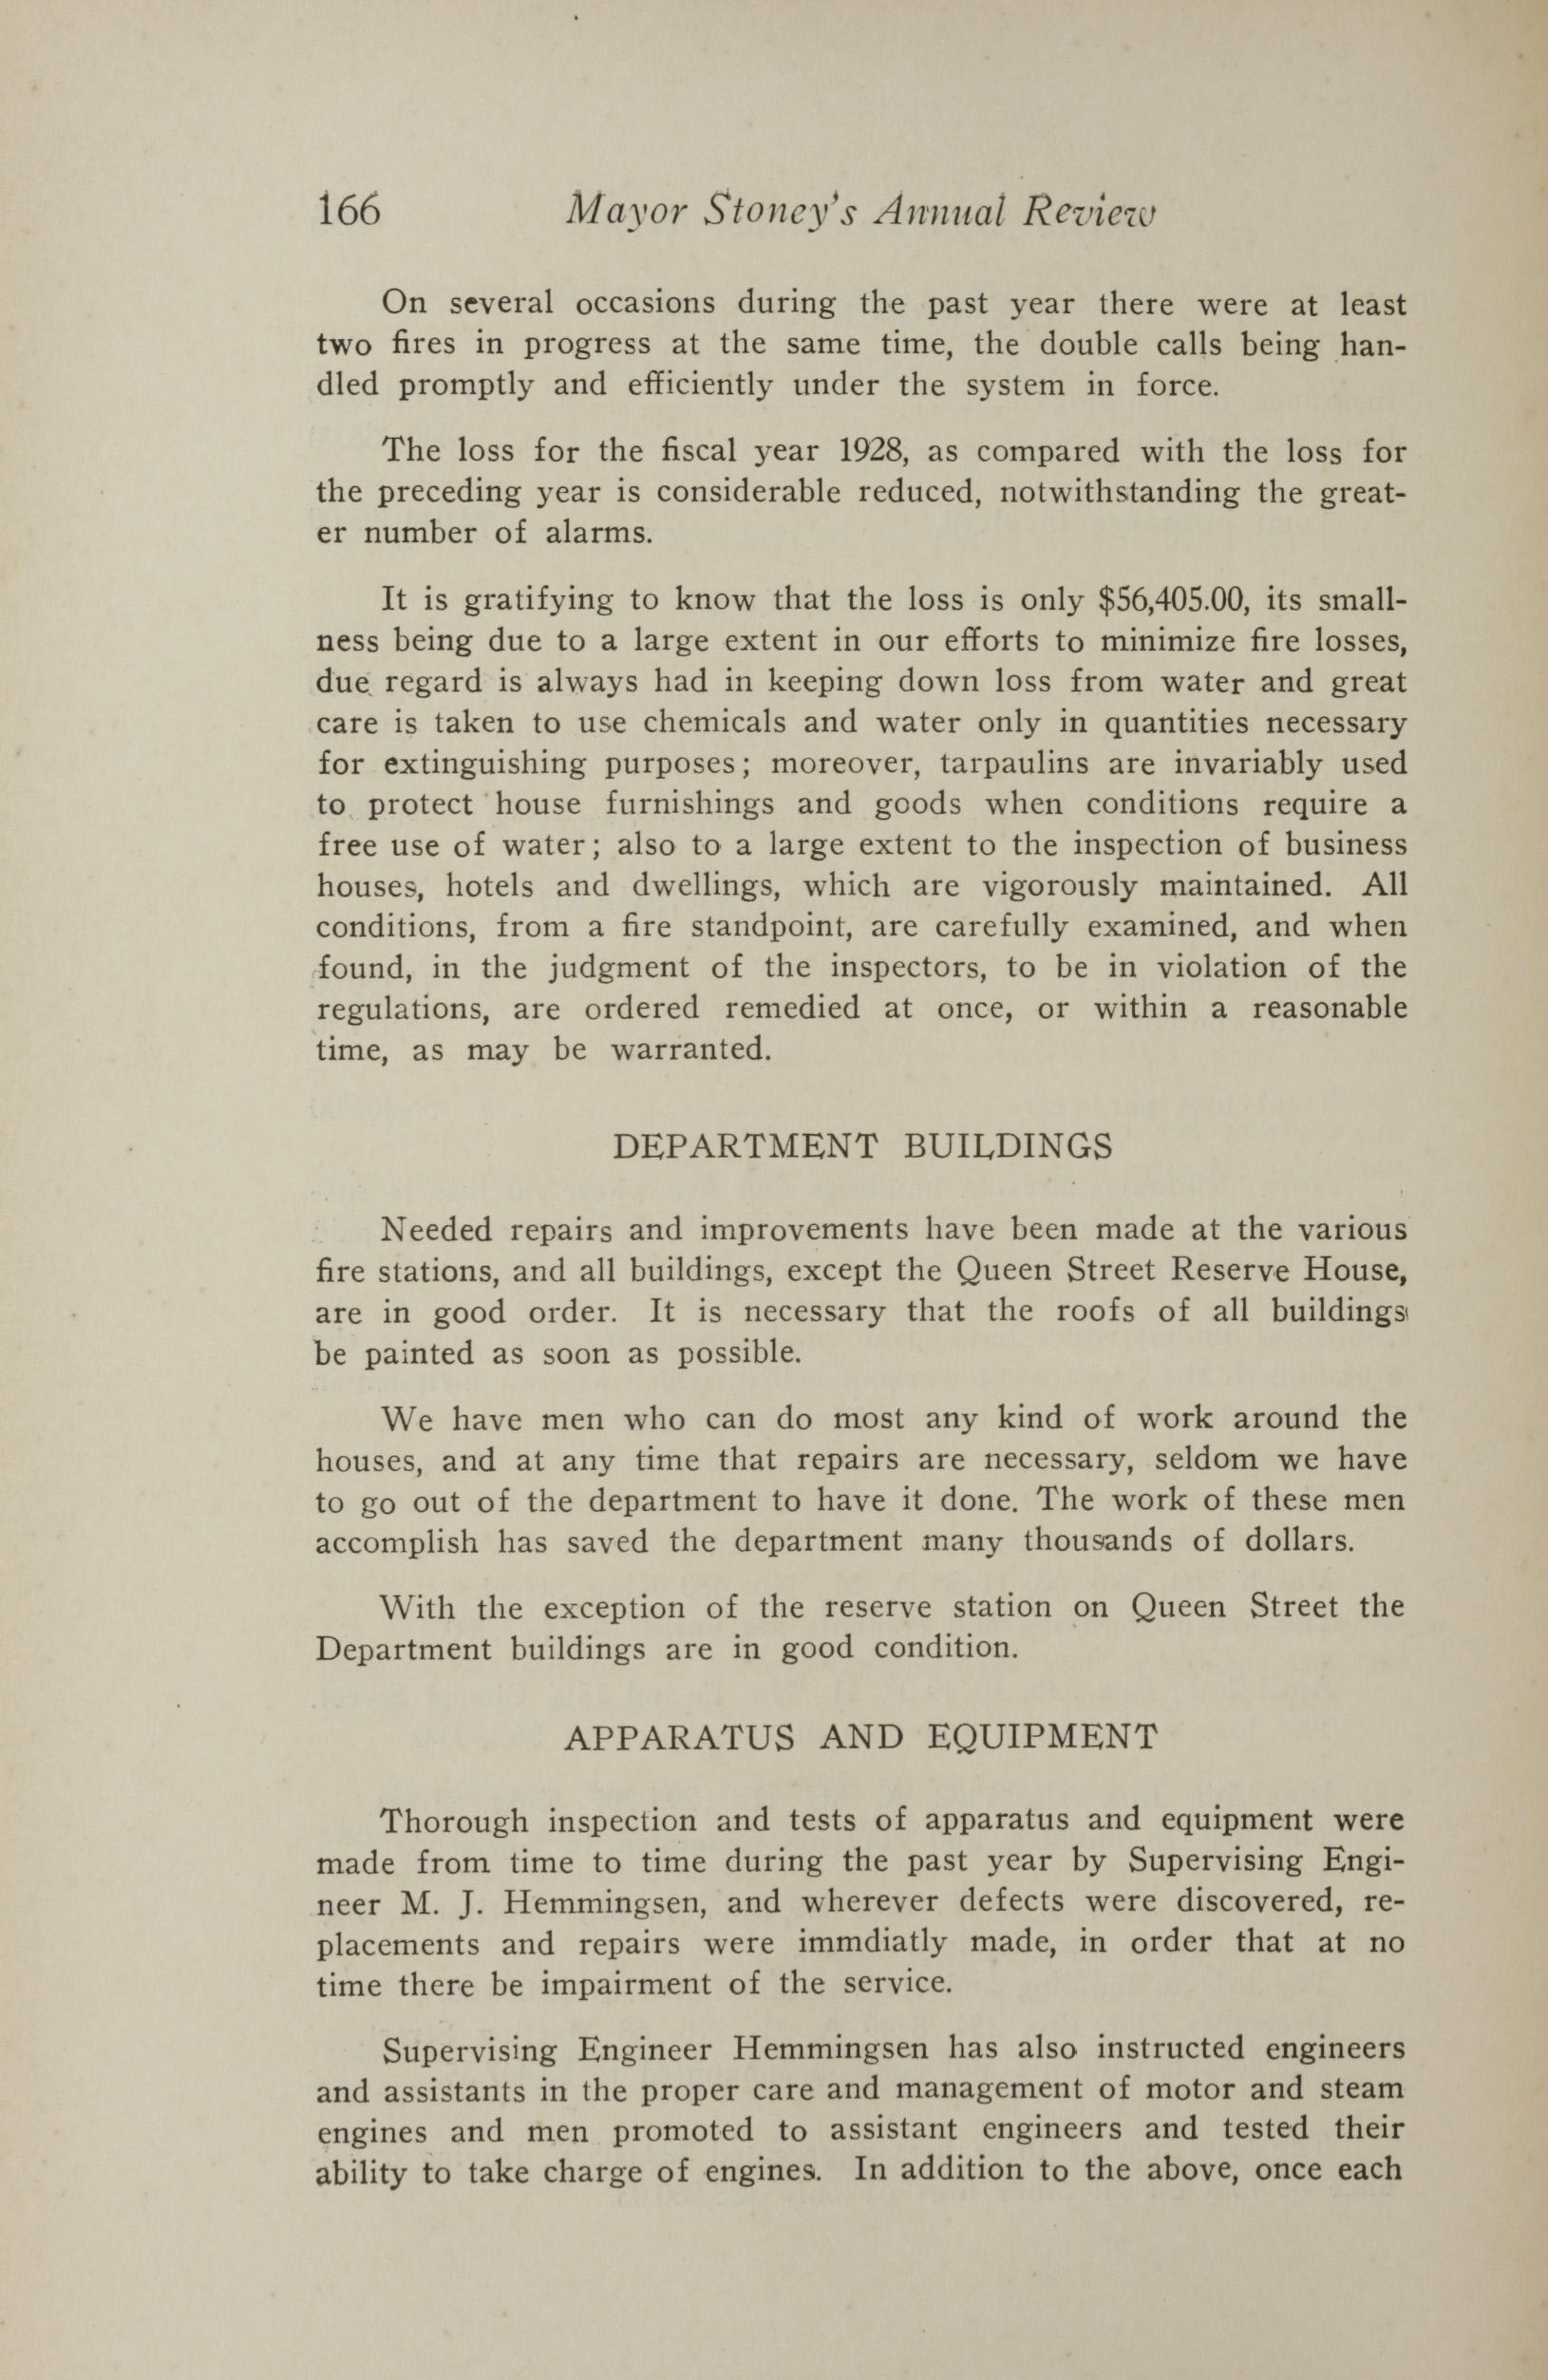 Charleston Yearbook, 1928, page 166